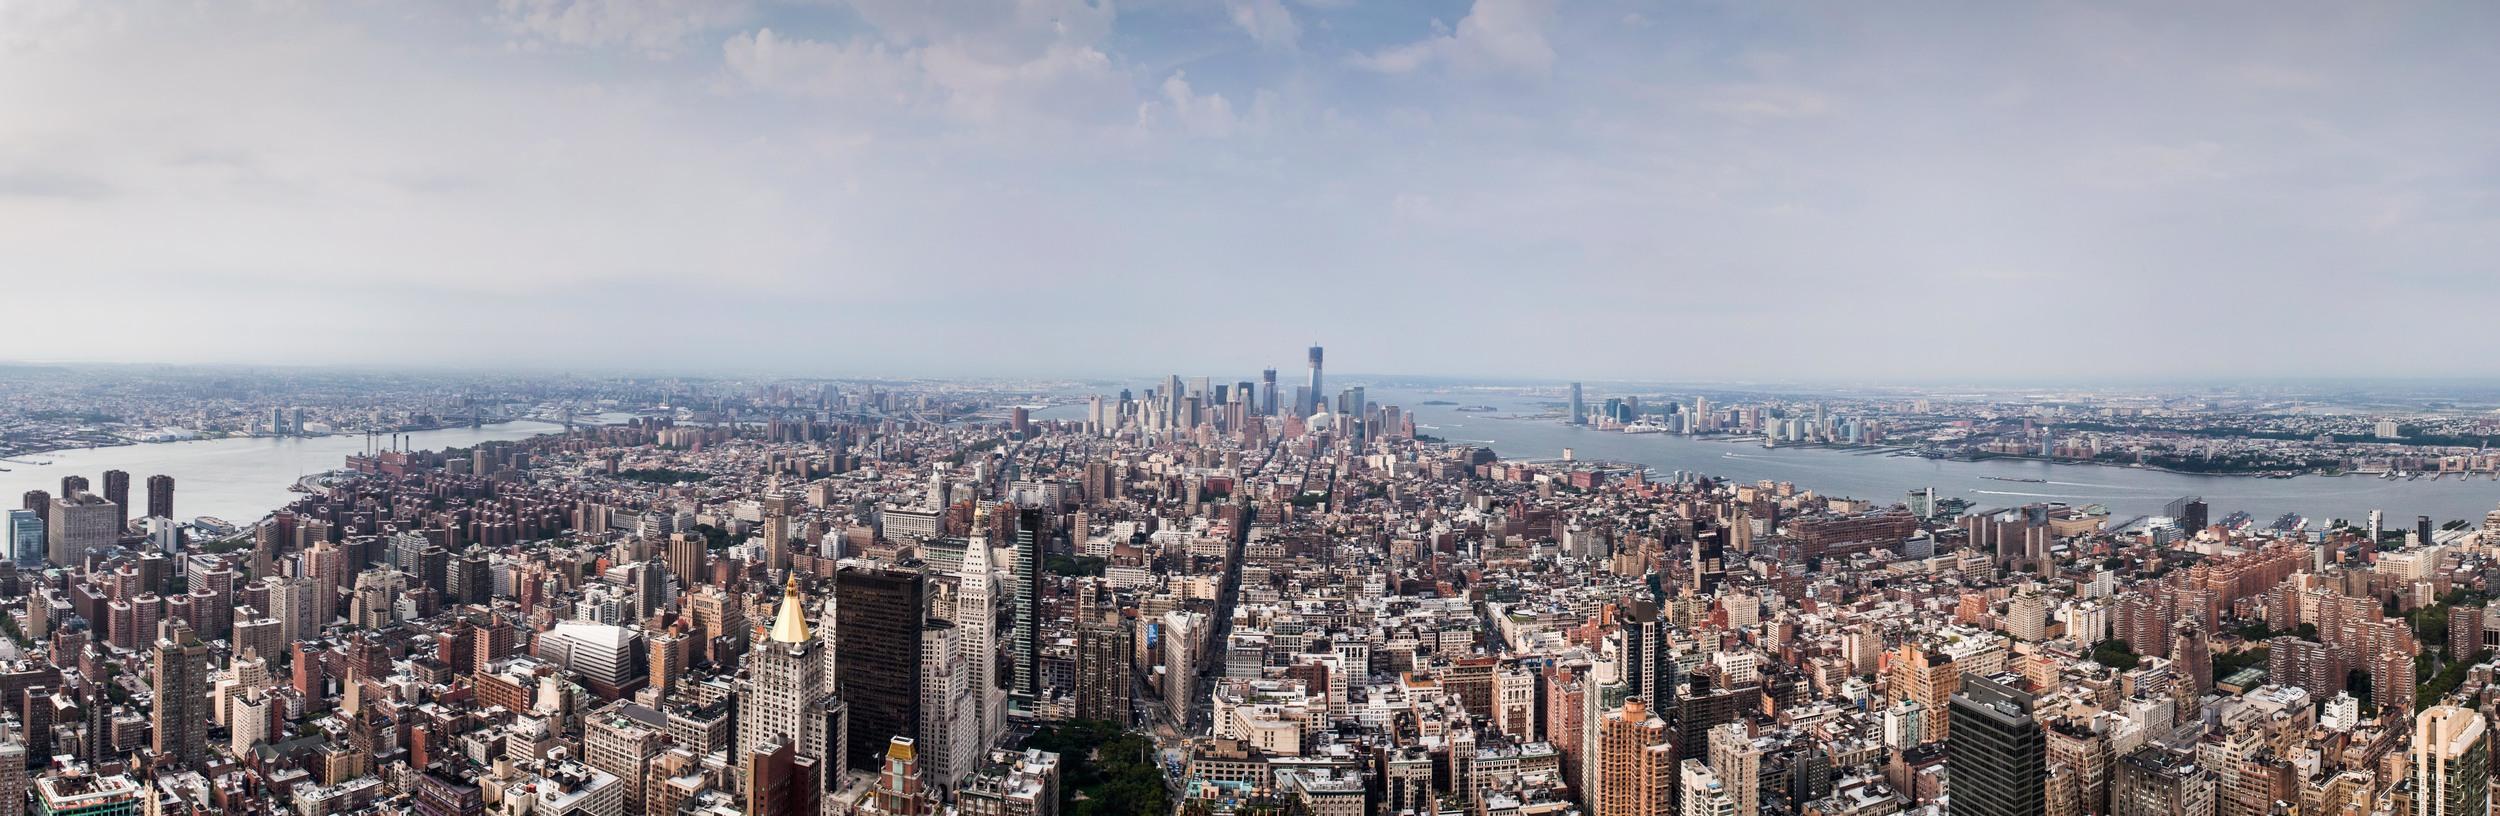 IMG_9190 Panorama.jpg